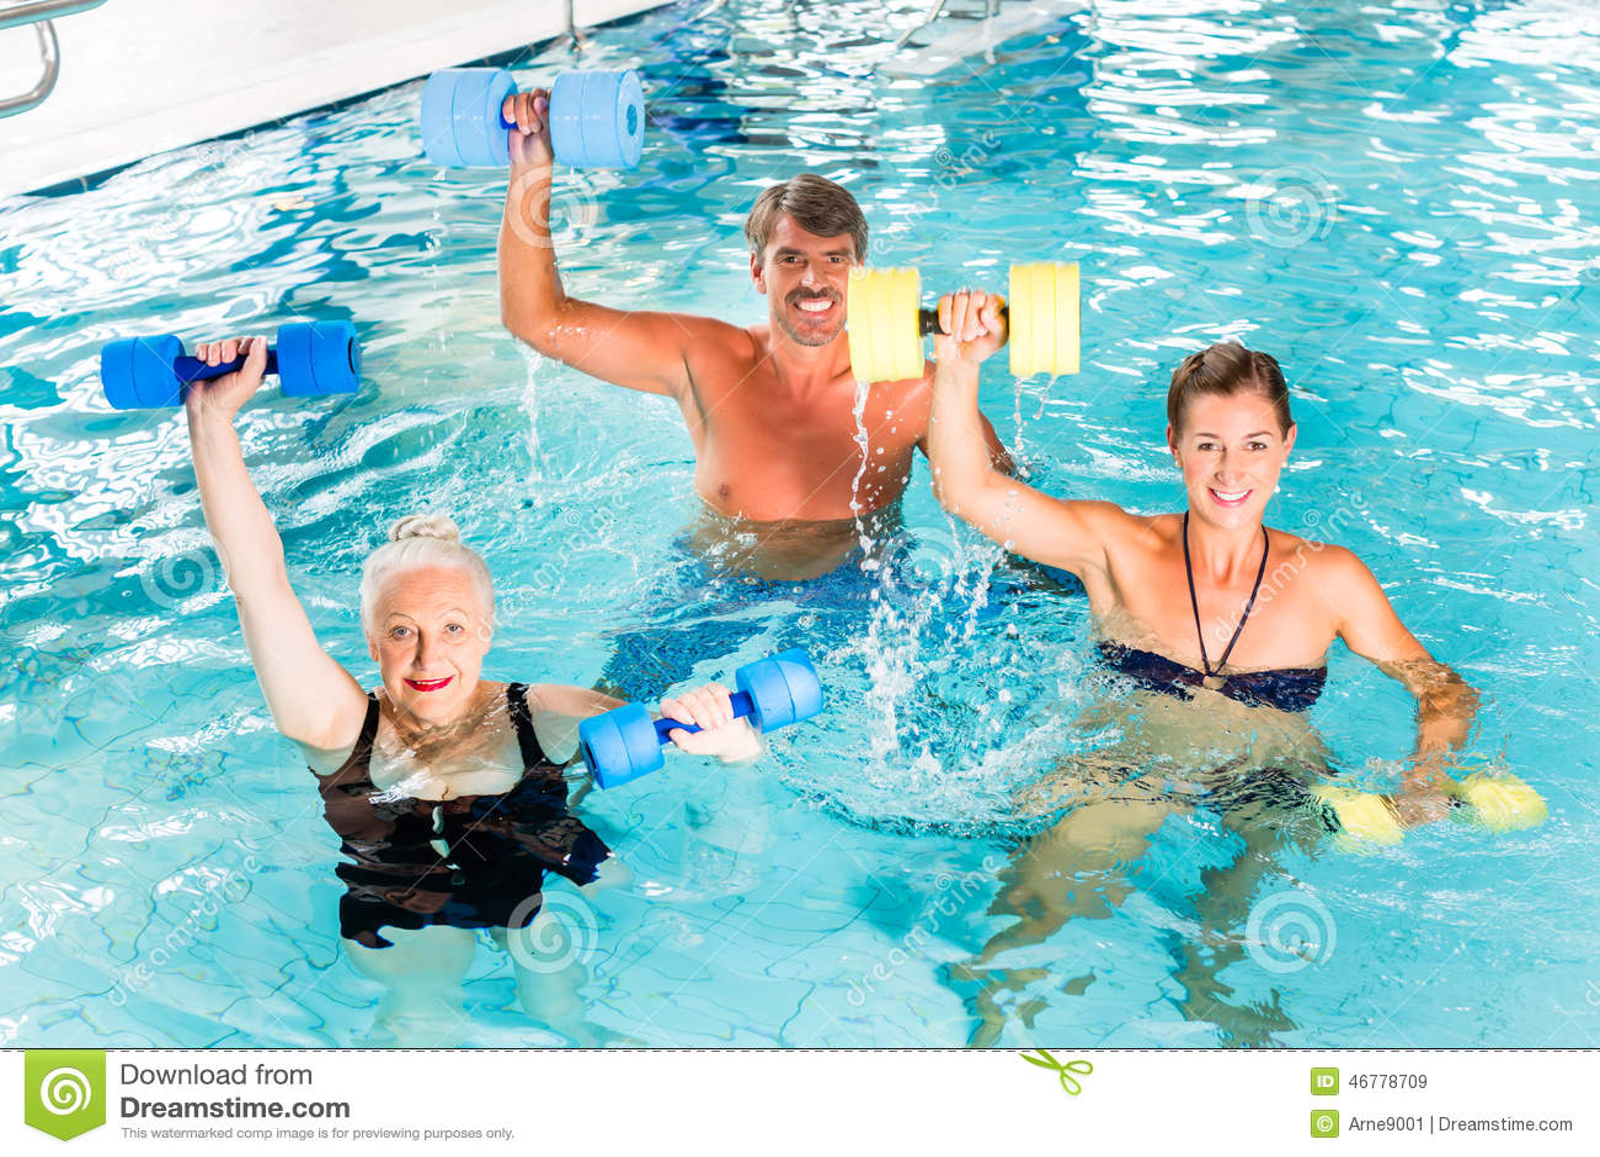 Groep mensen bij watergymnastiek of aquarobics